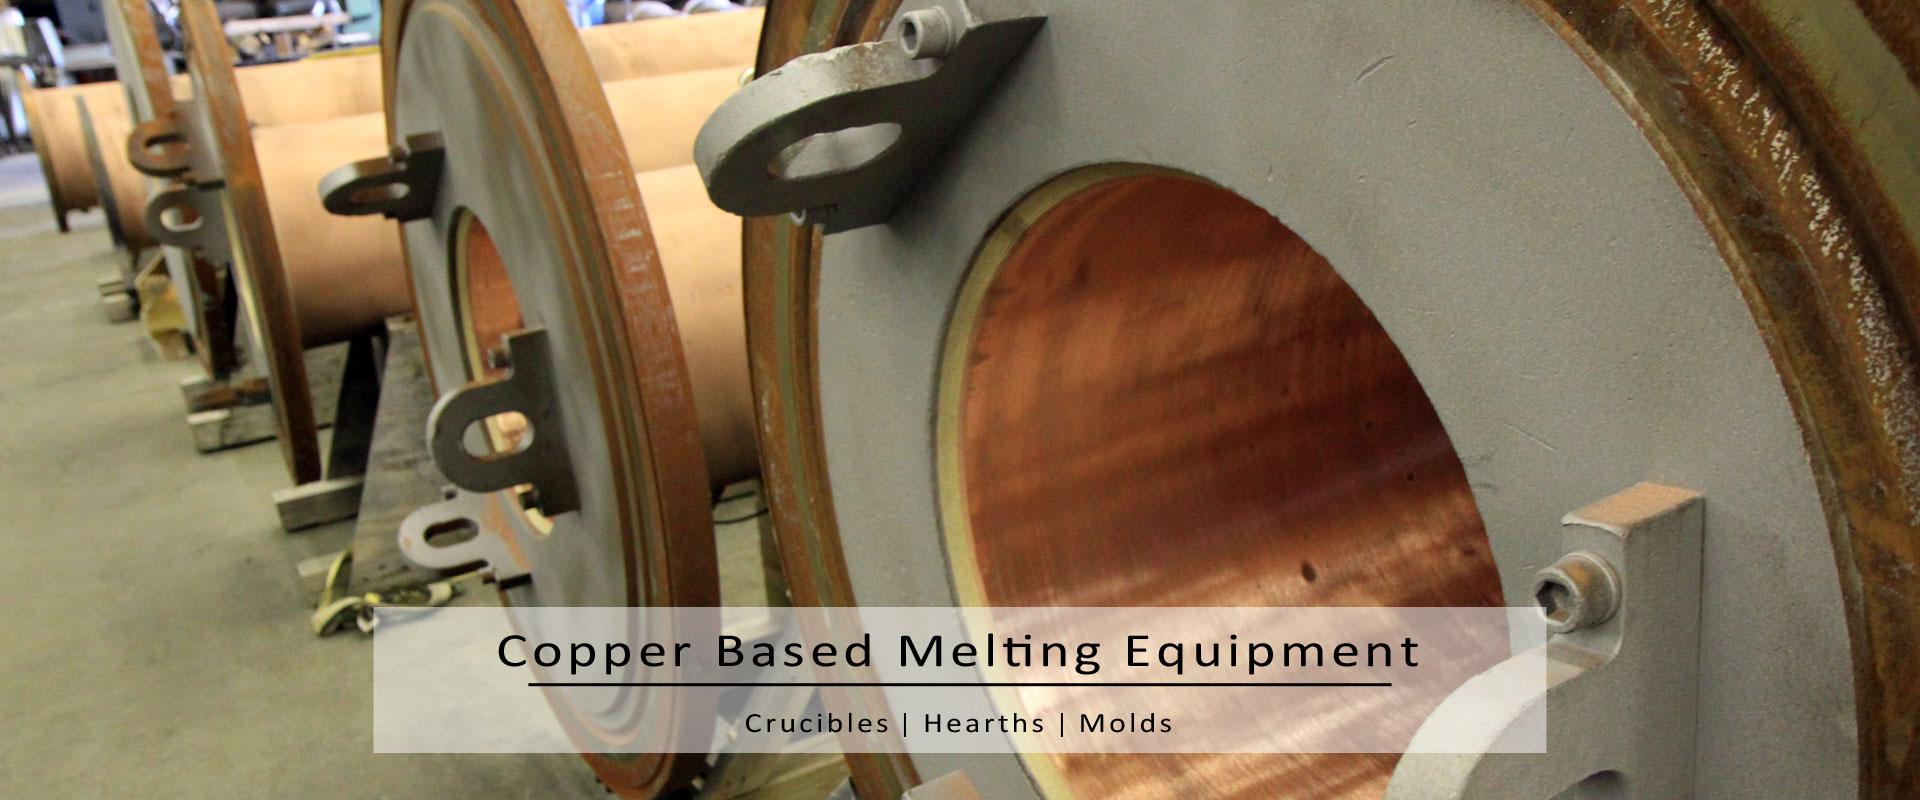 copper based melting equipment-crucibles-hearths-molds